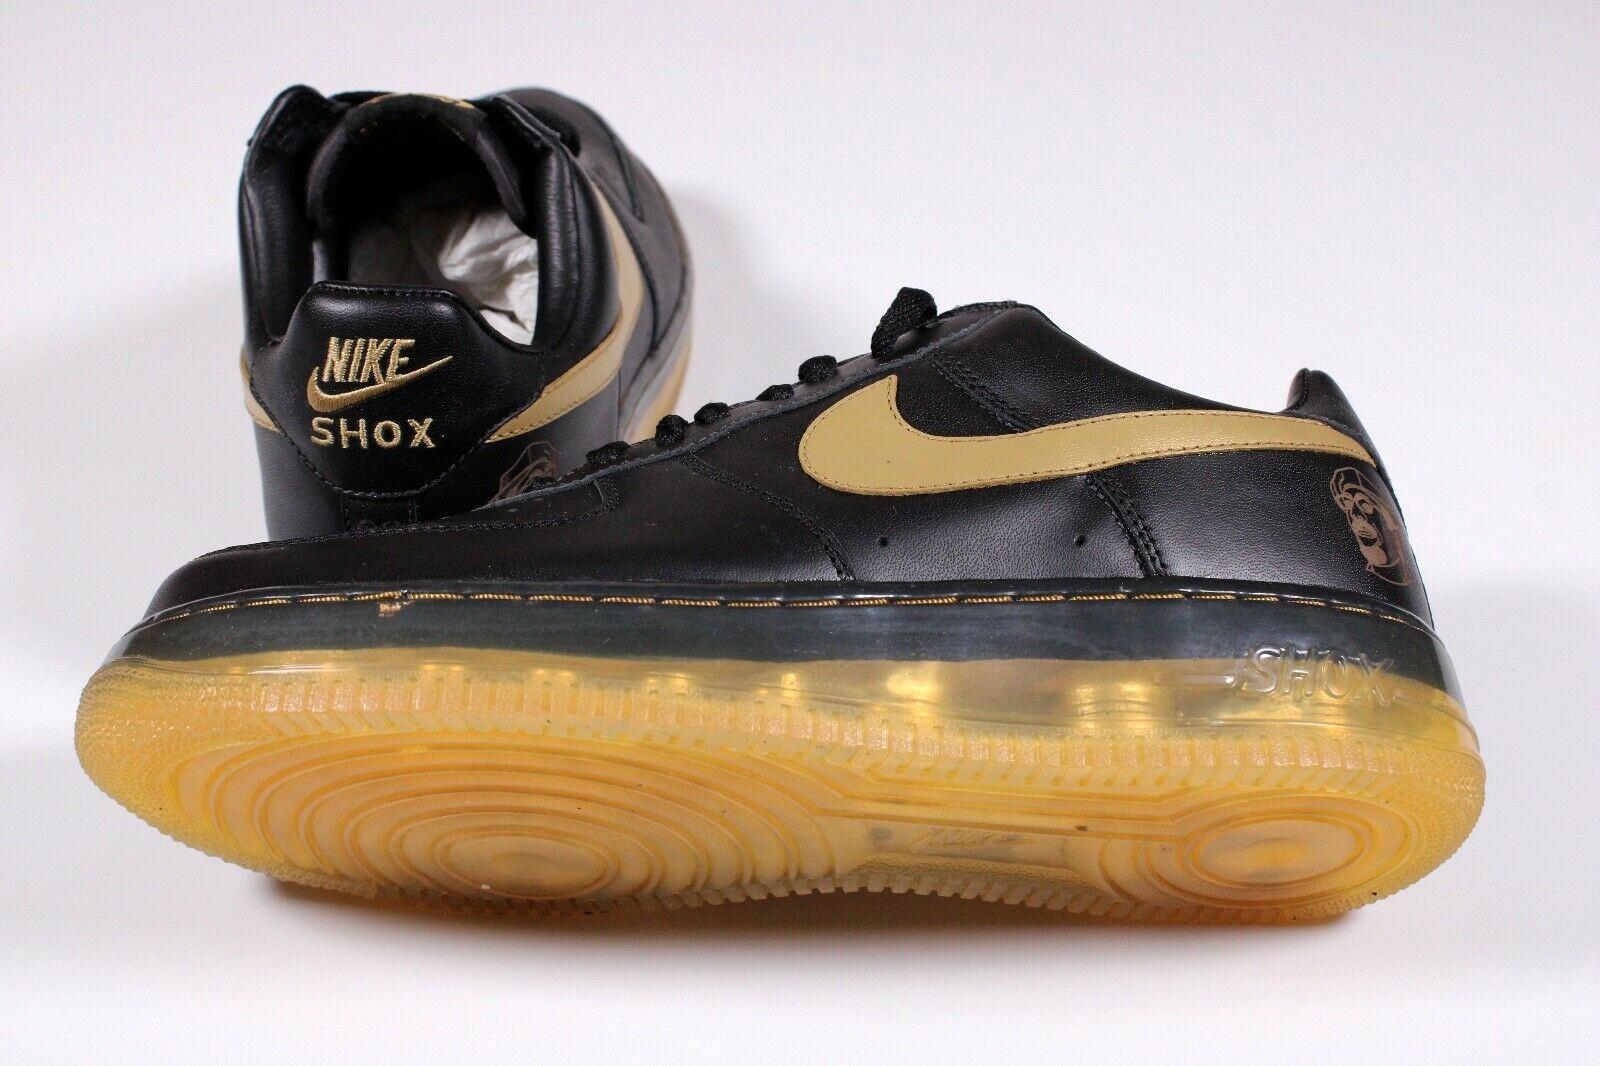 Сэмплы Nike Innovation Kitchen можно купить на eBay